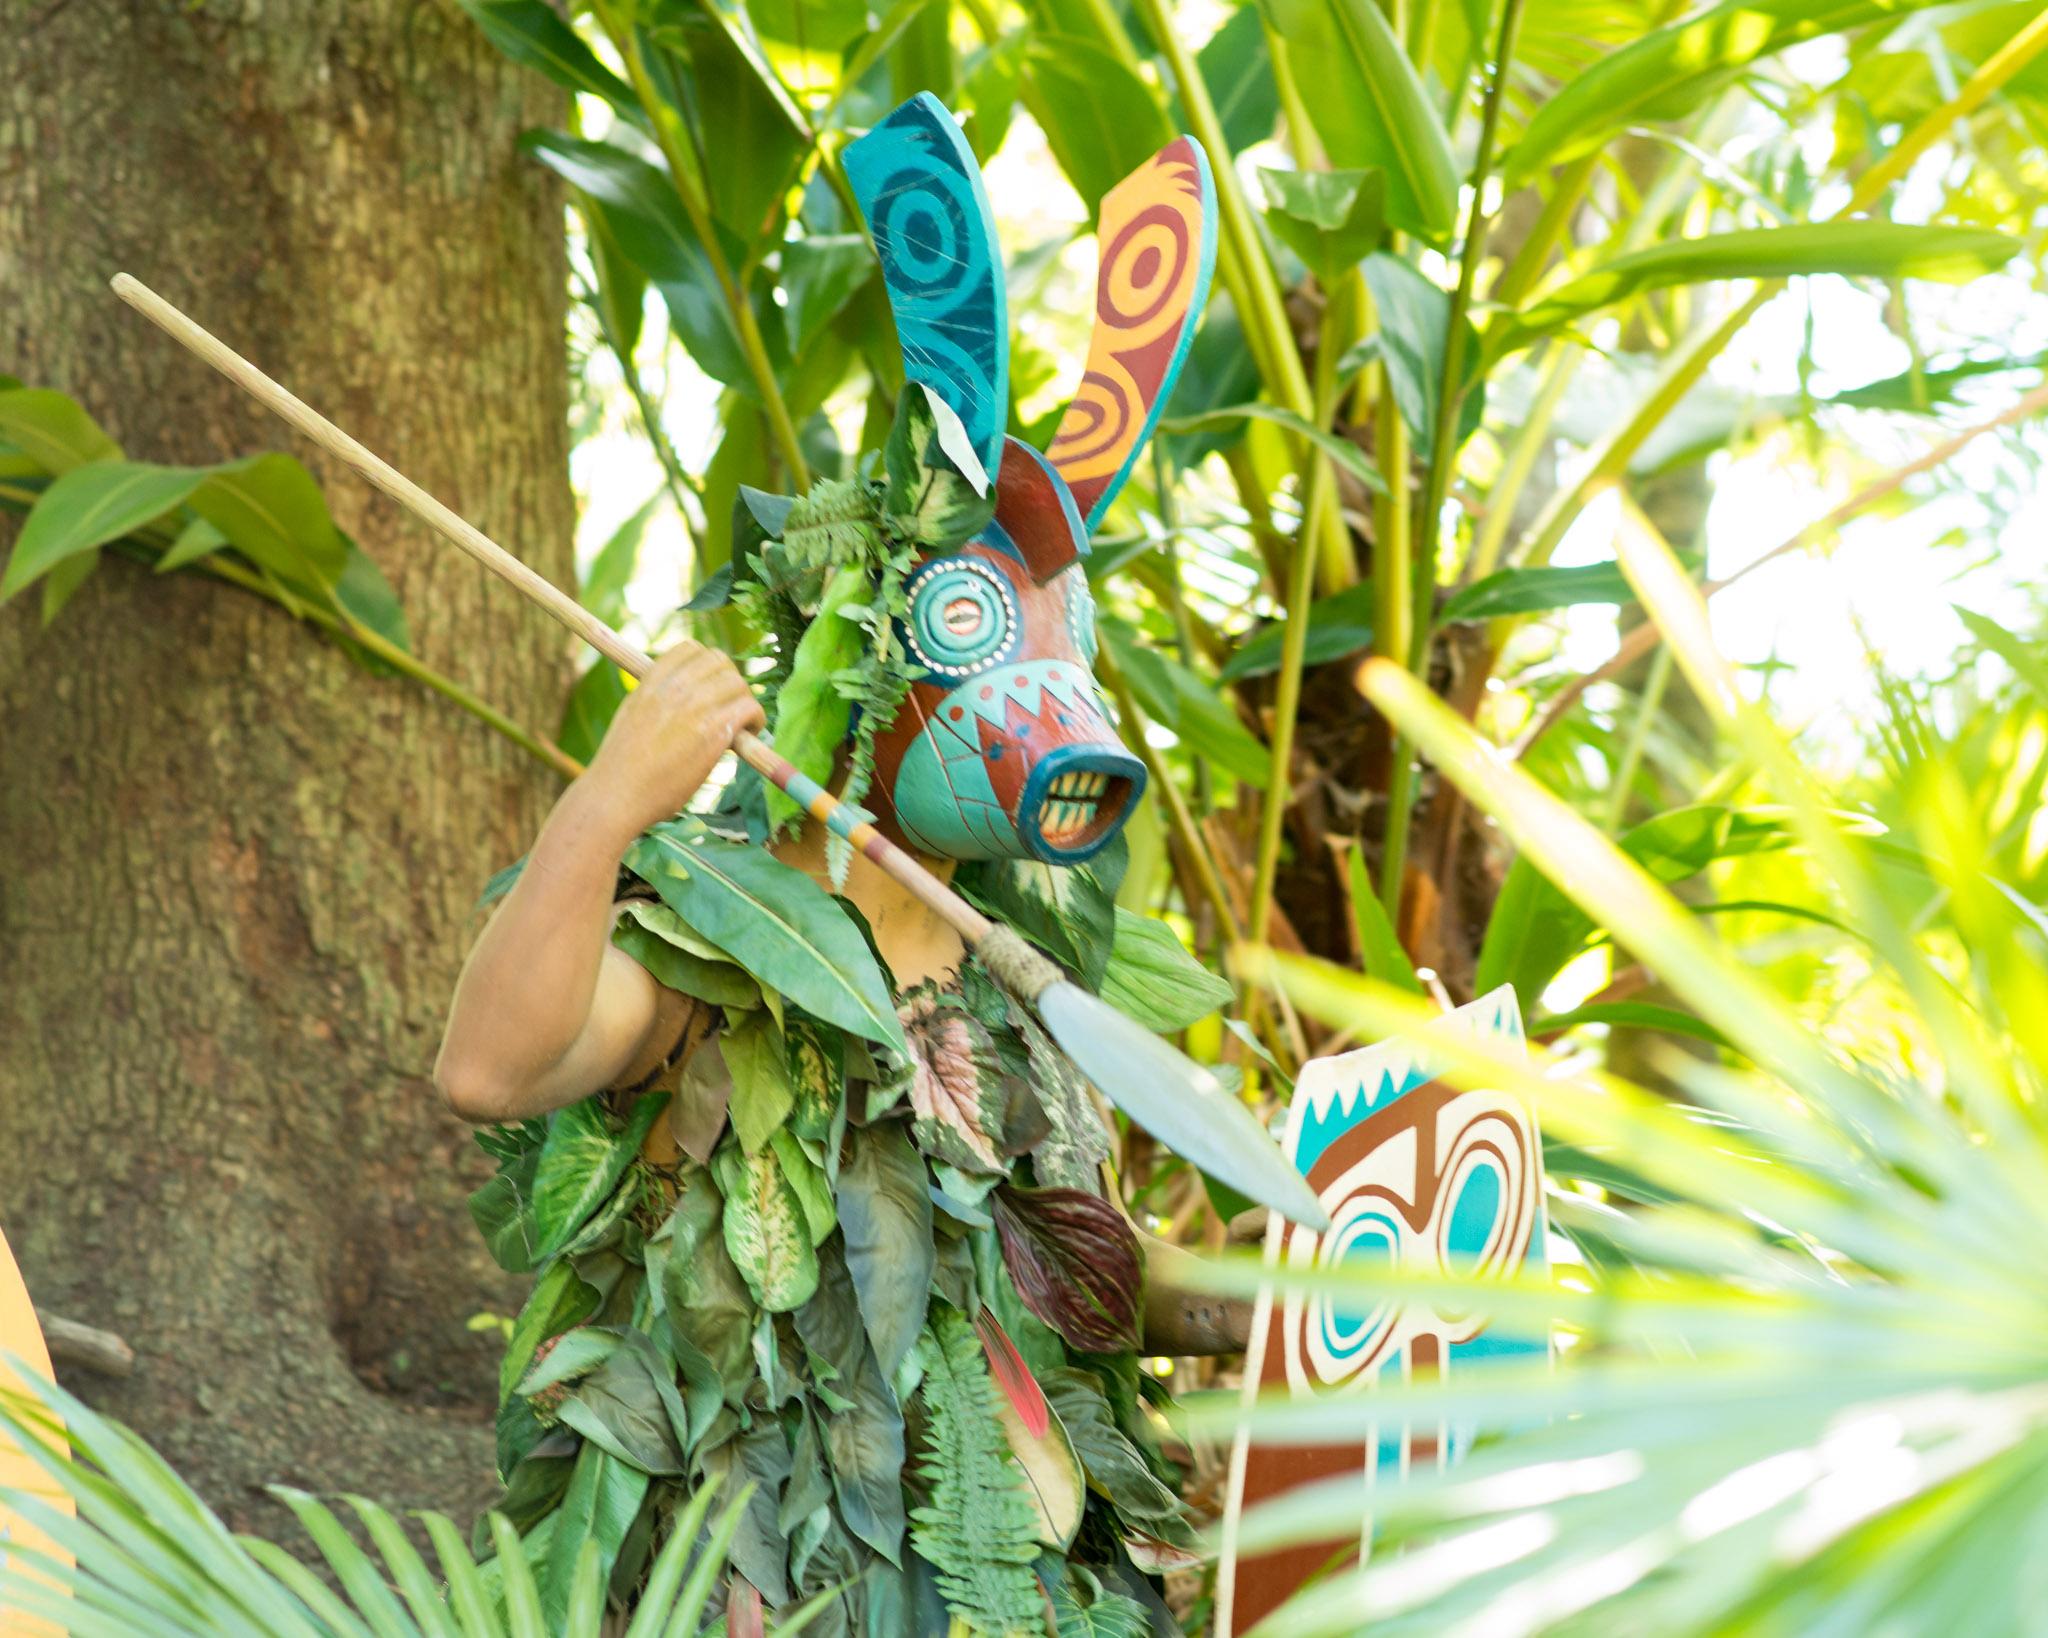 Jungle Cruise Spear Guy - Walt Disney World Magic Kingdom